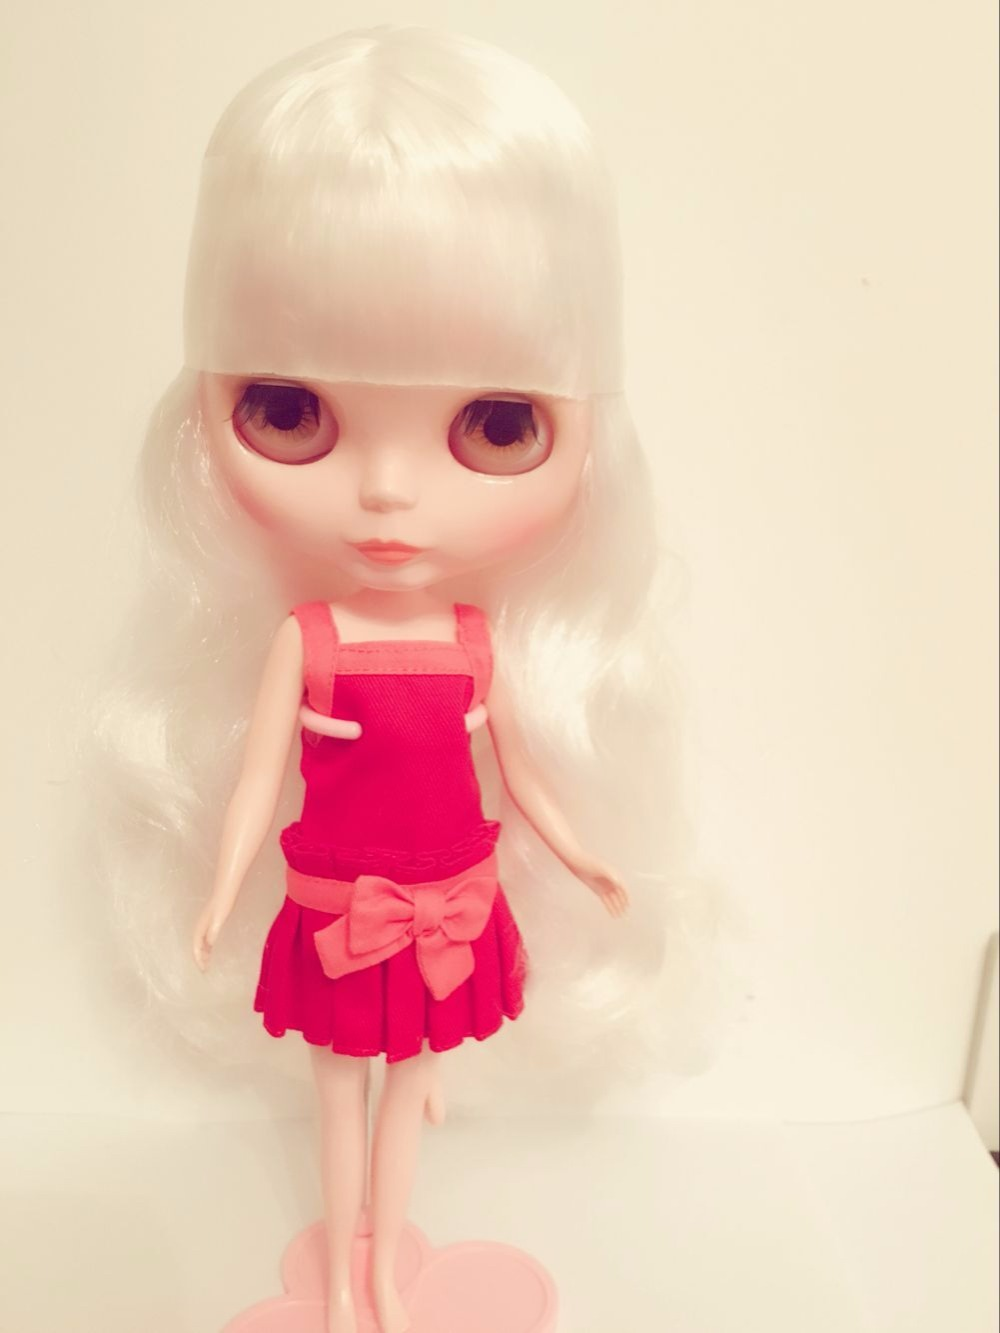 free-shipping-top-discount-fontb4-b-font-colors-big-eyes-diy-nude-blyth-doll-item-no-fontb0-b-font-d